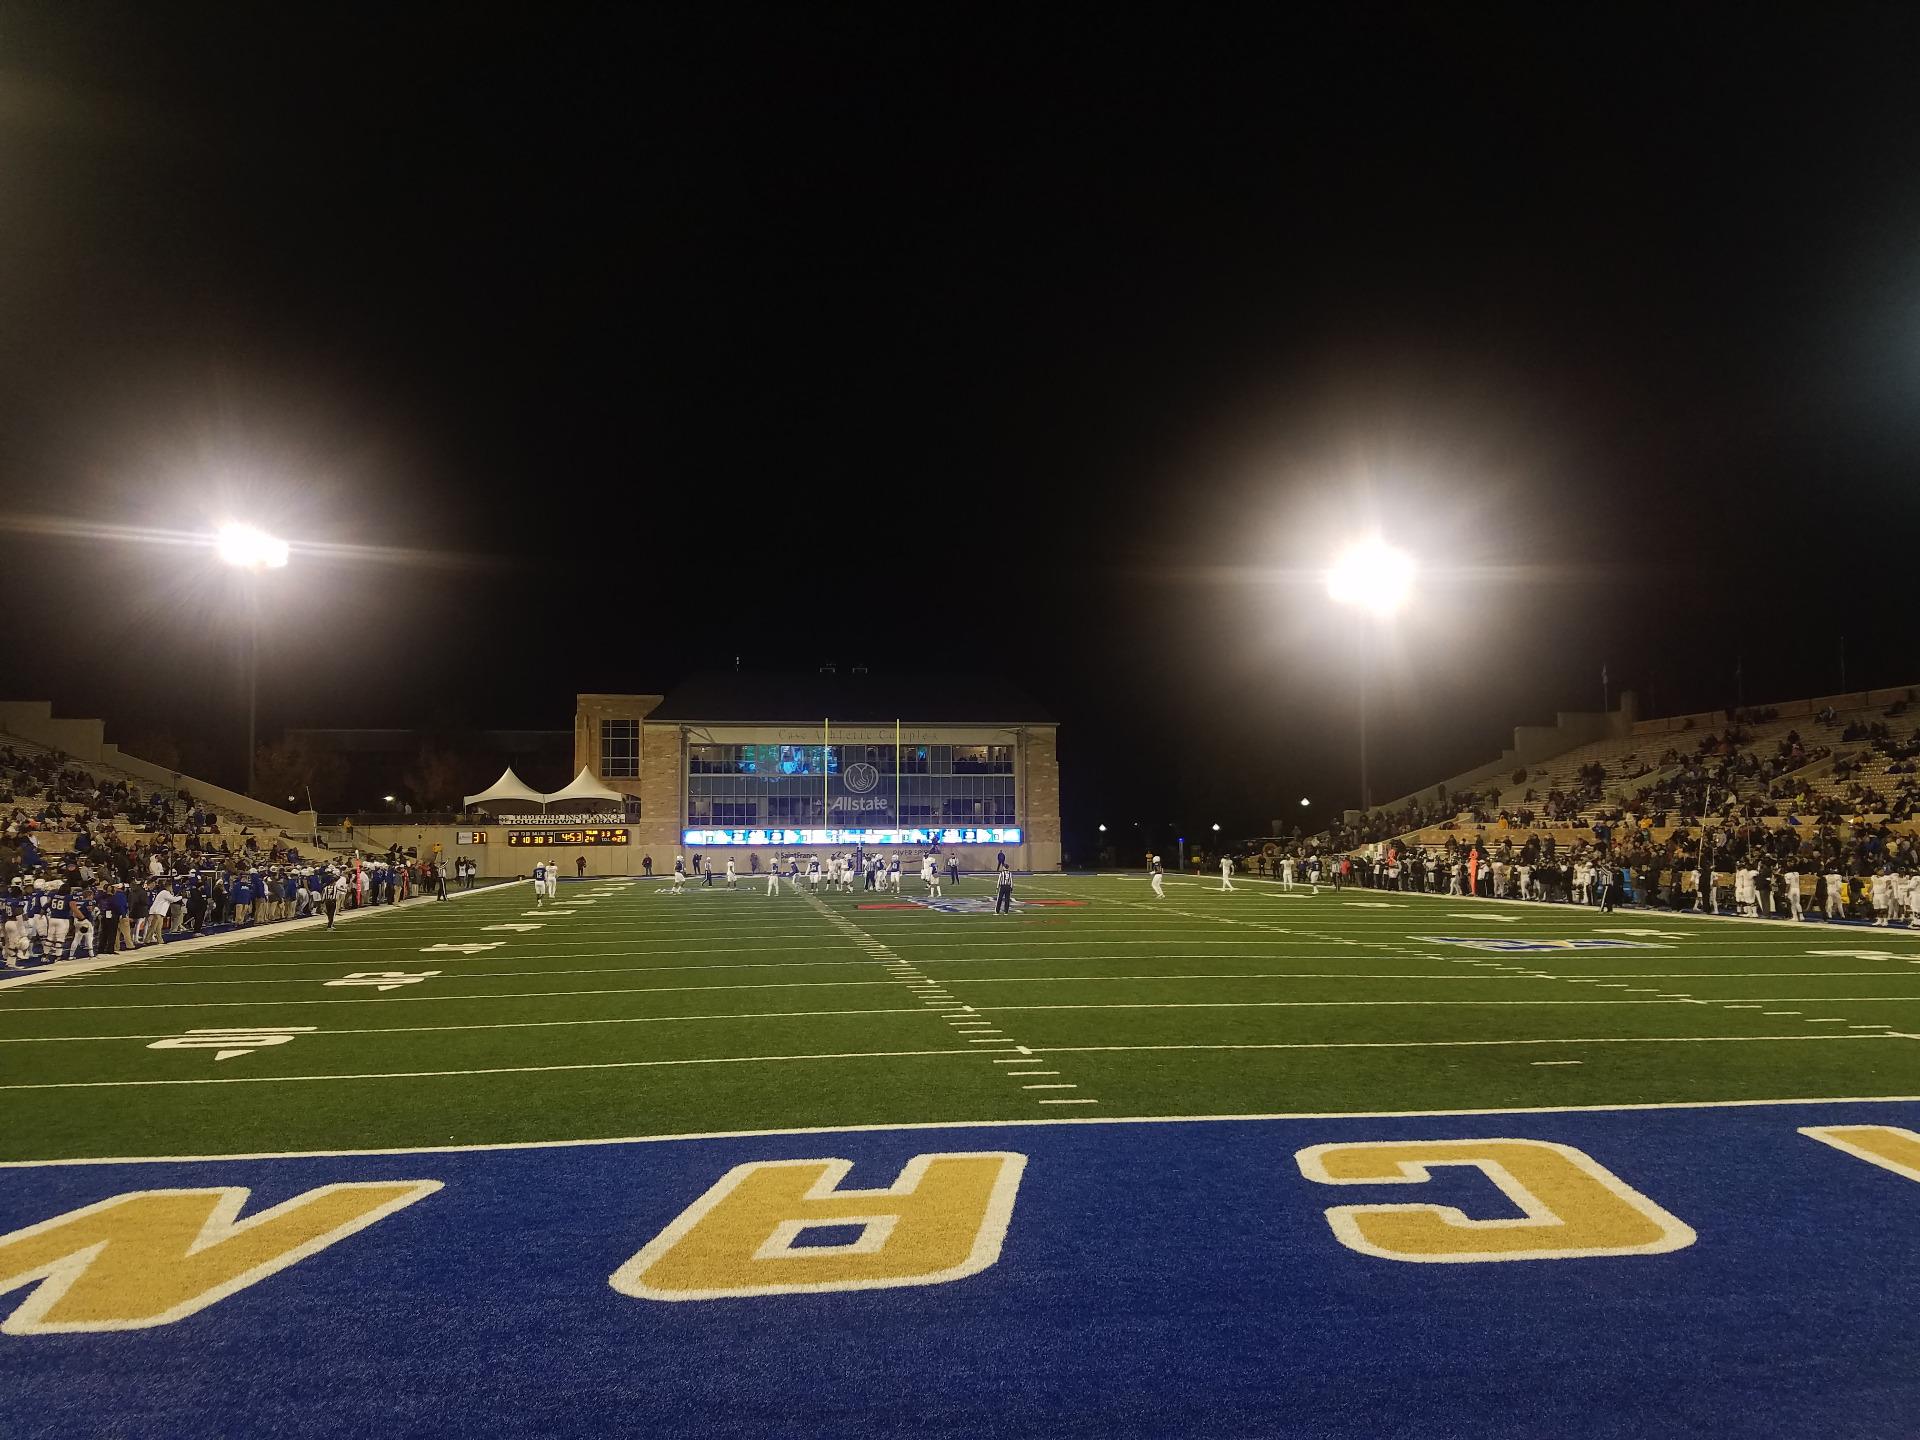 H. A. Chapman Stadium Section 112 Row 3 Seat 4